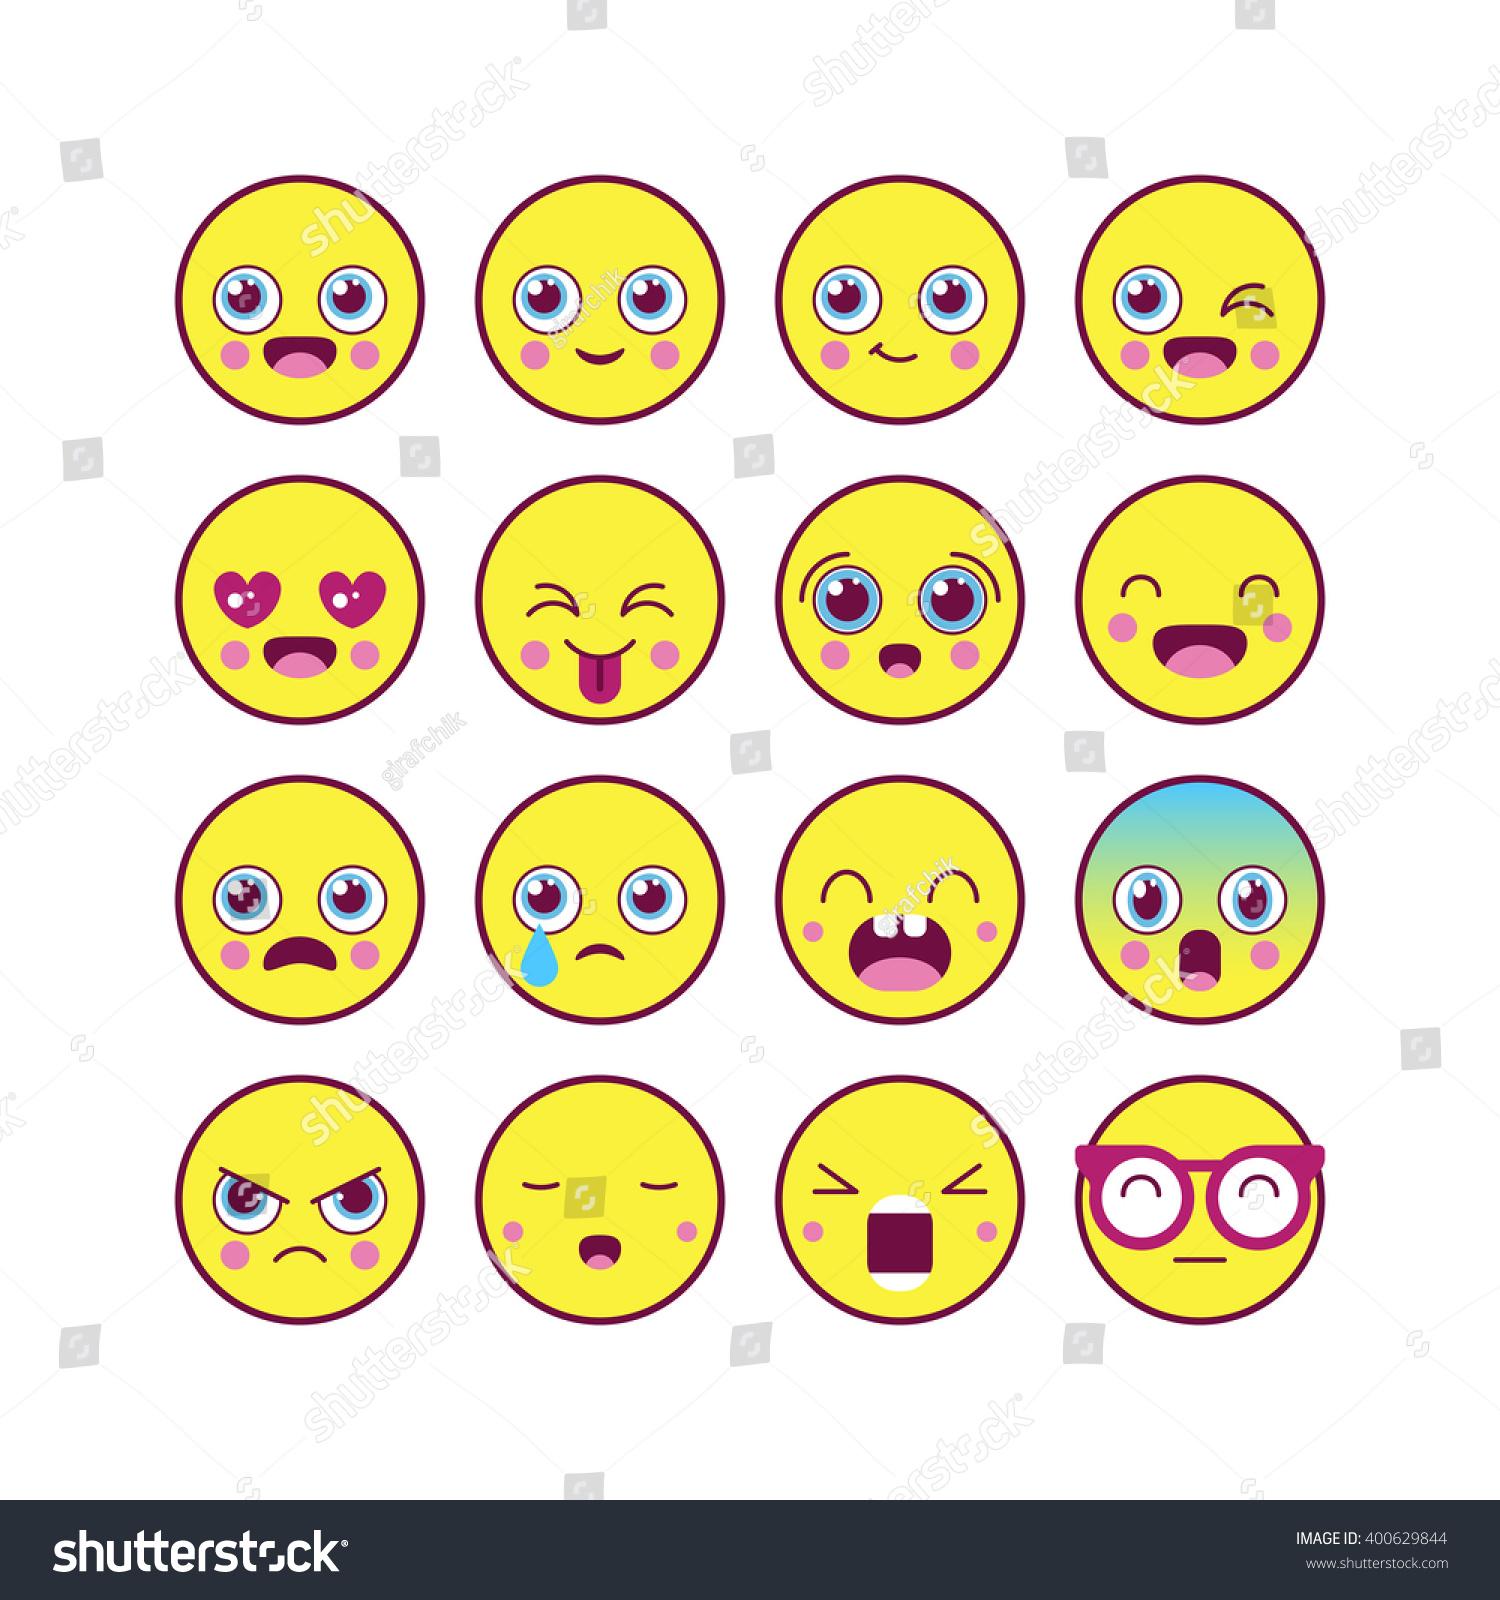 Emoticons emoji linear icon set kawaii stock vector 400629844 shutterstock - Emoticone kawaii ...